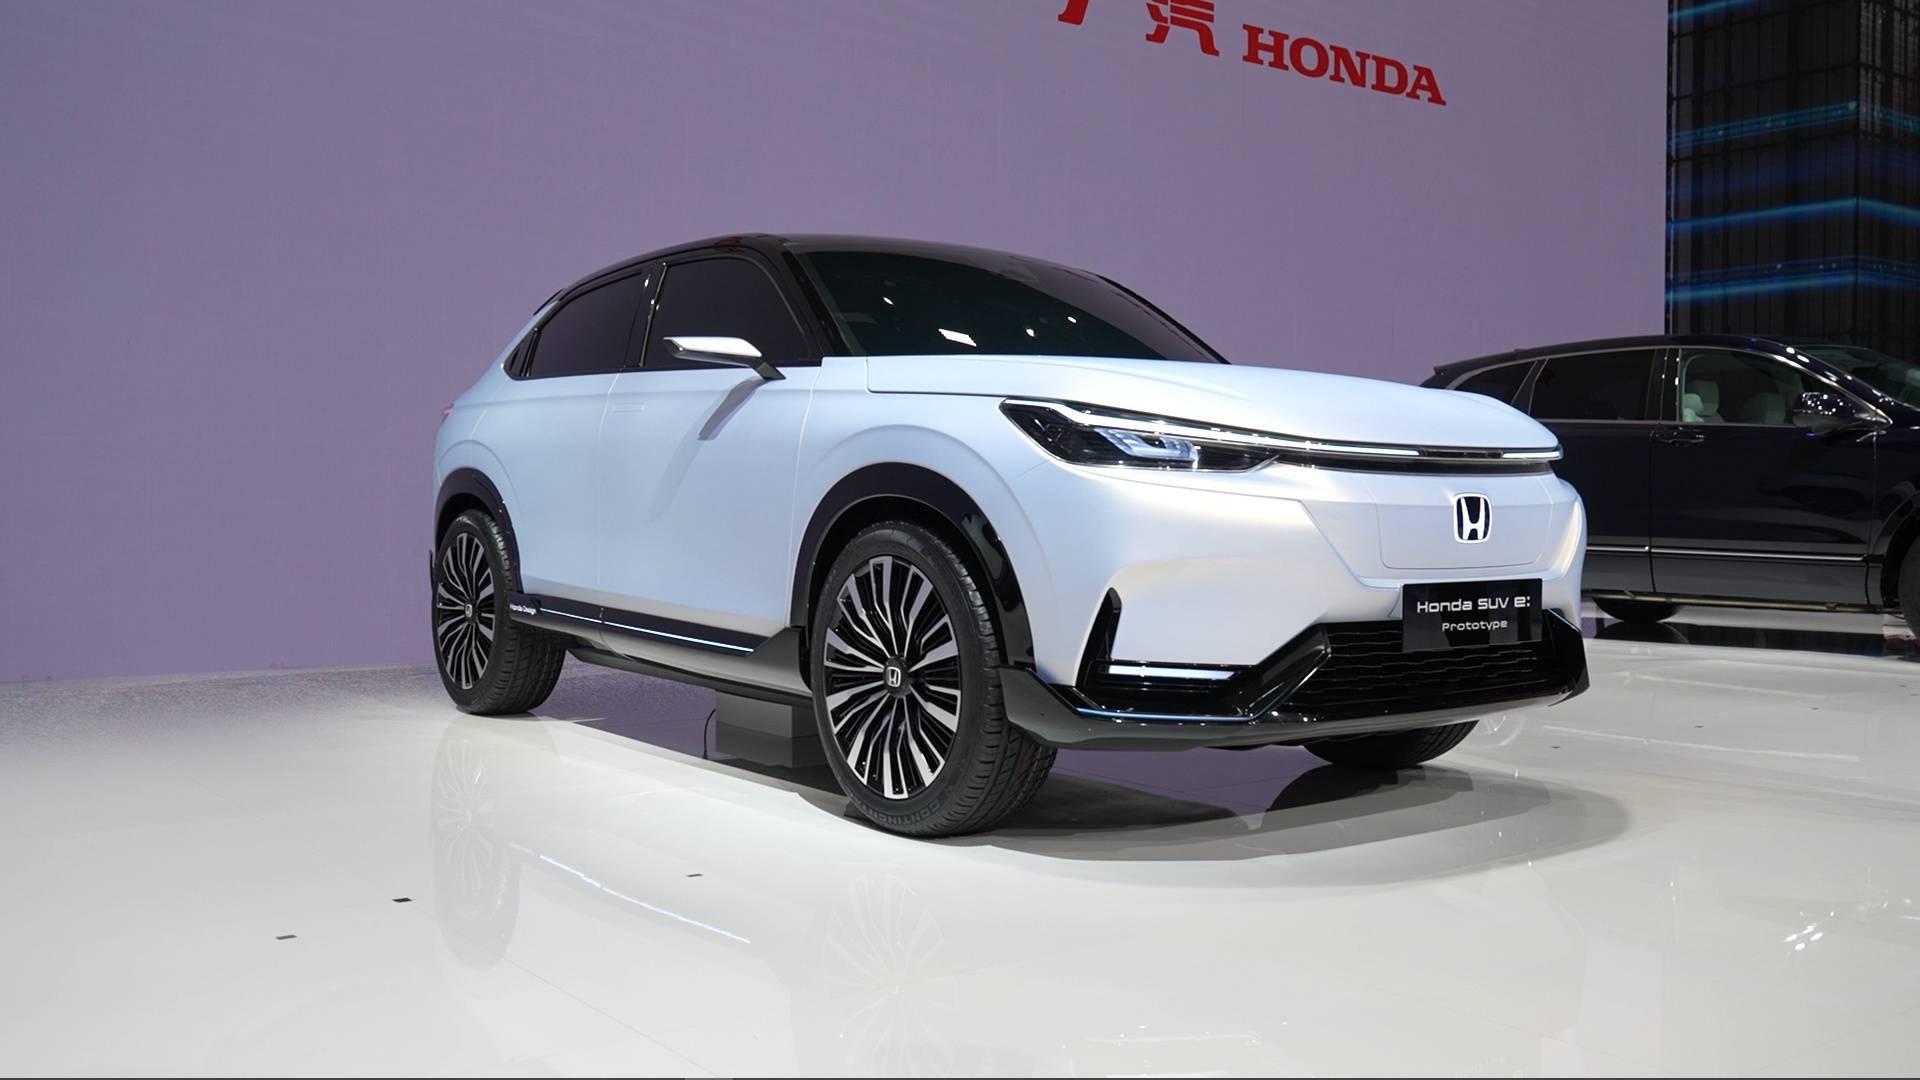 Honda SUV e:prototype亮相!本田粉带你逛上海车展本田展台!